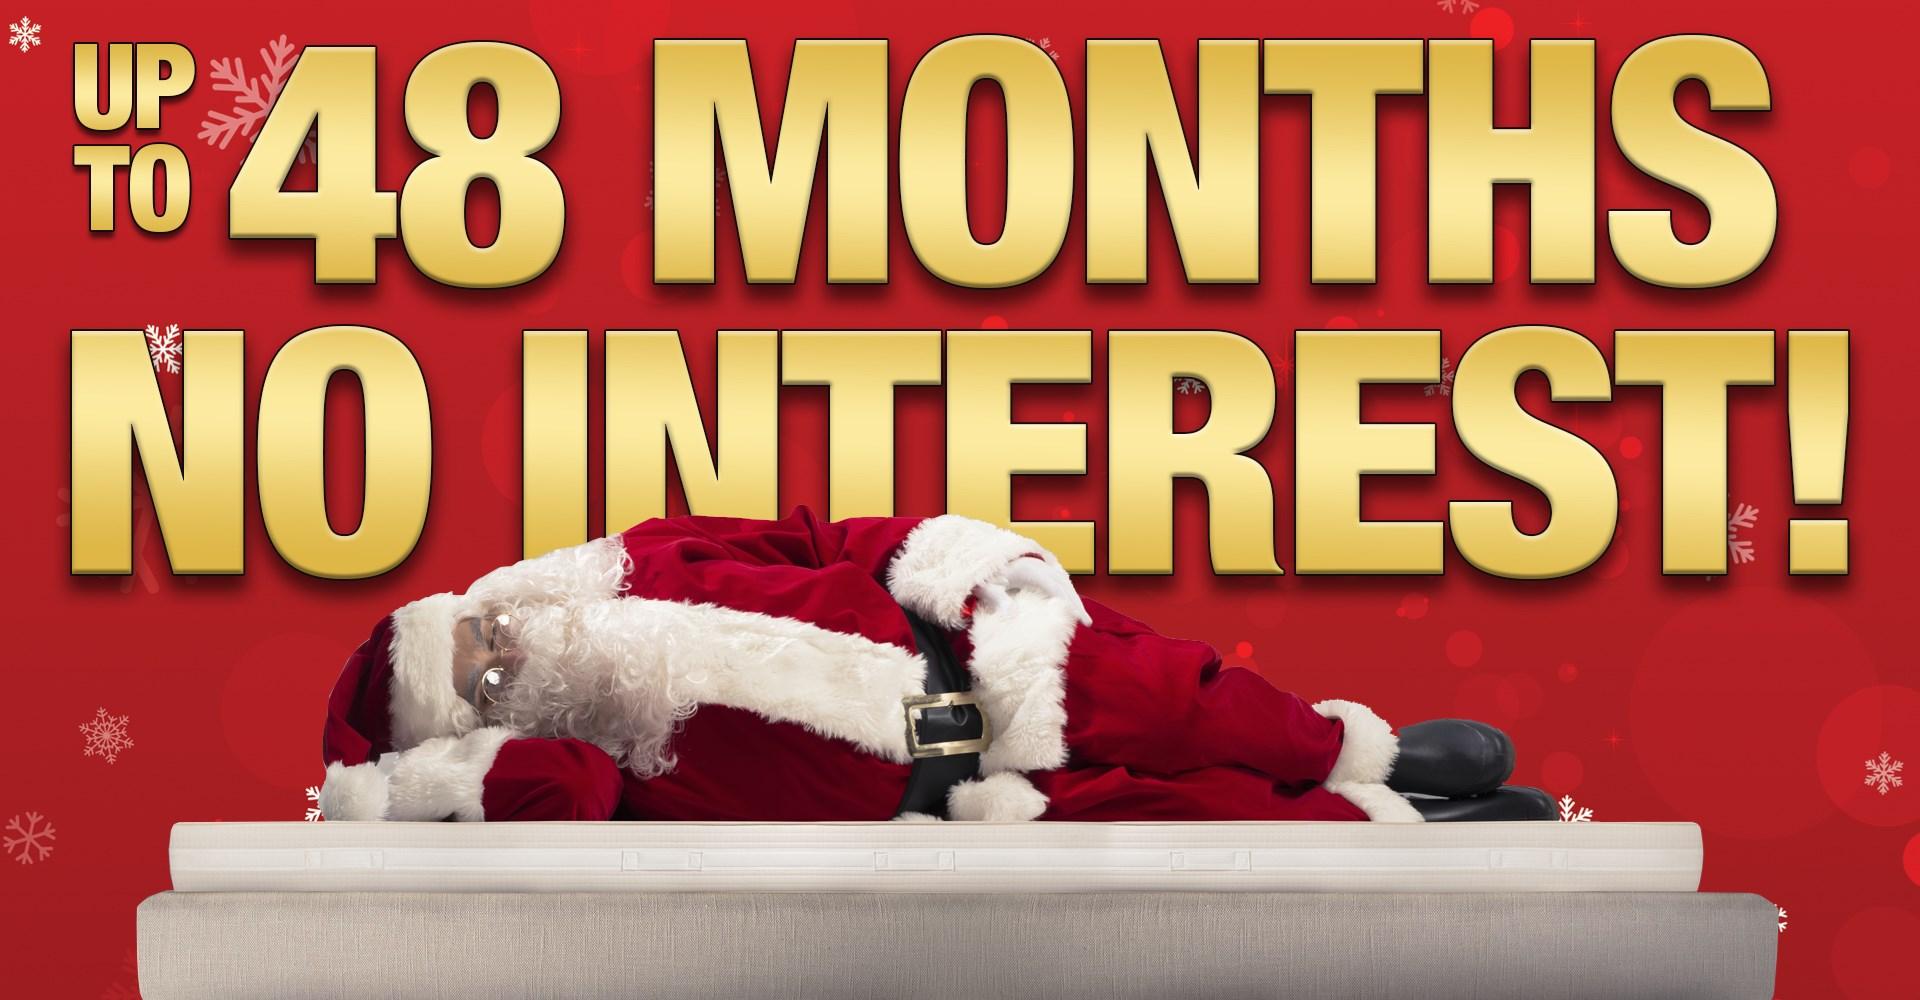 Sadlers Up To 48 Months No Interest